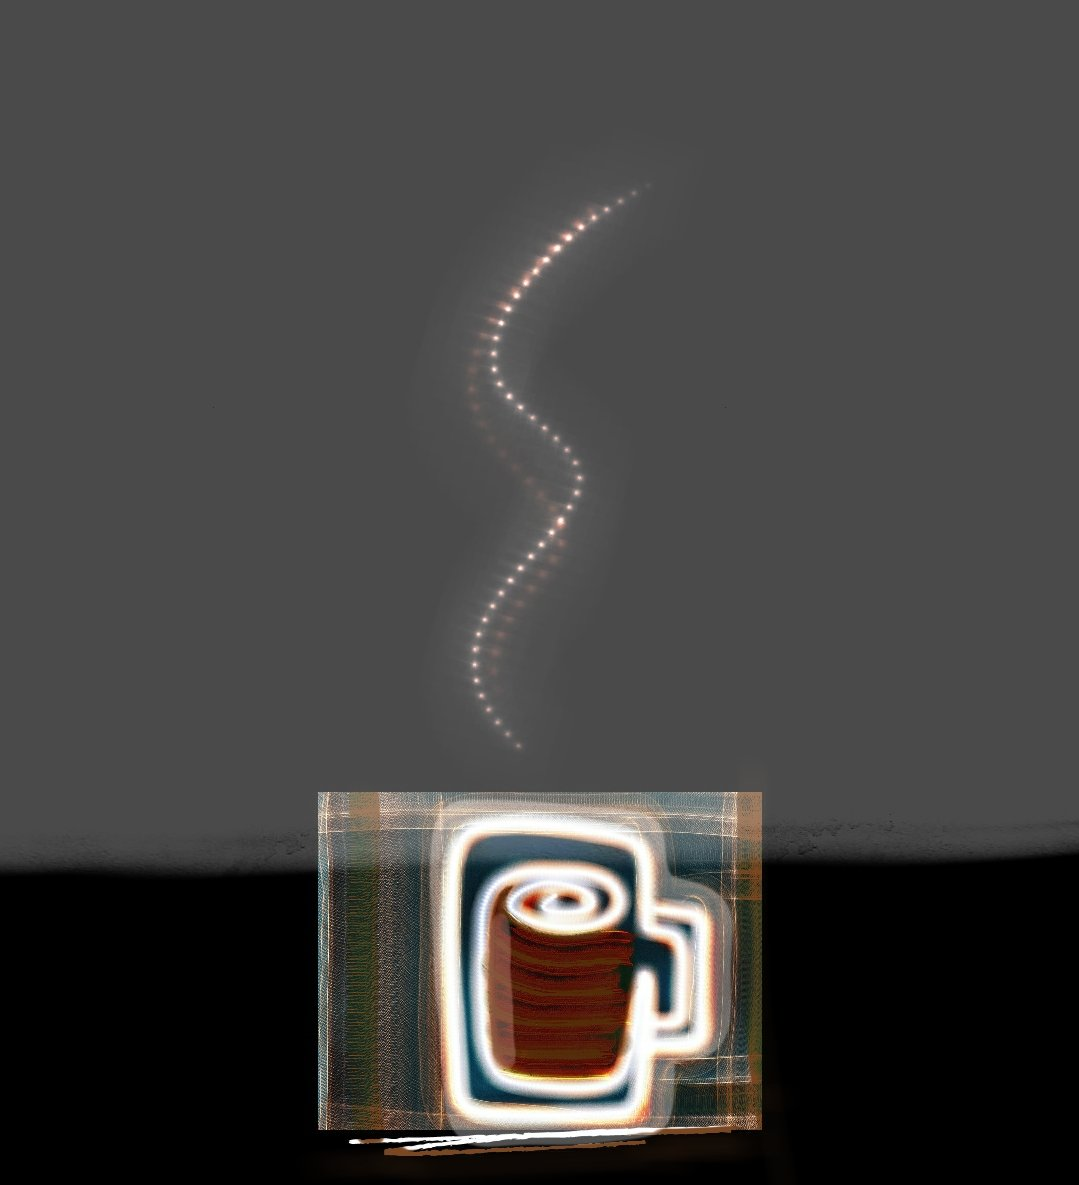 #ArtistOnTwitter #art #coffeetime https://t.co/SSxGK0hXJk